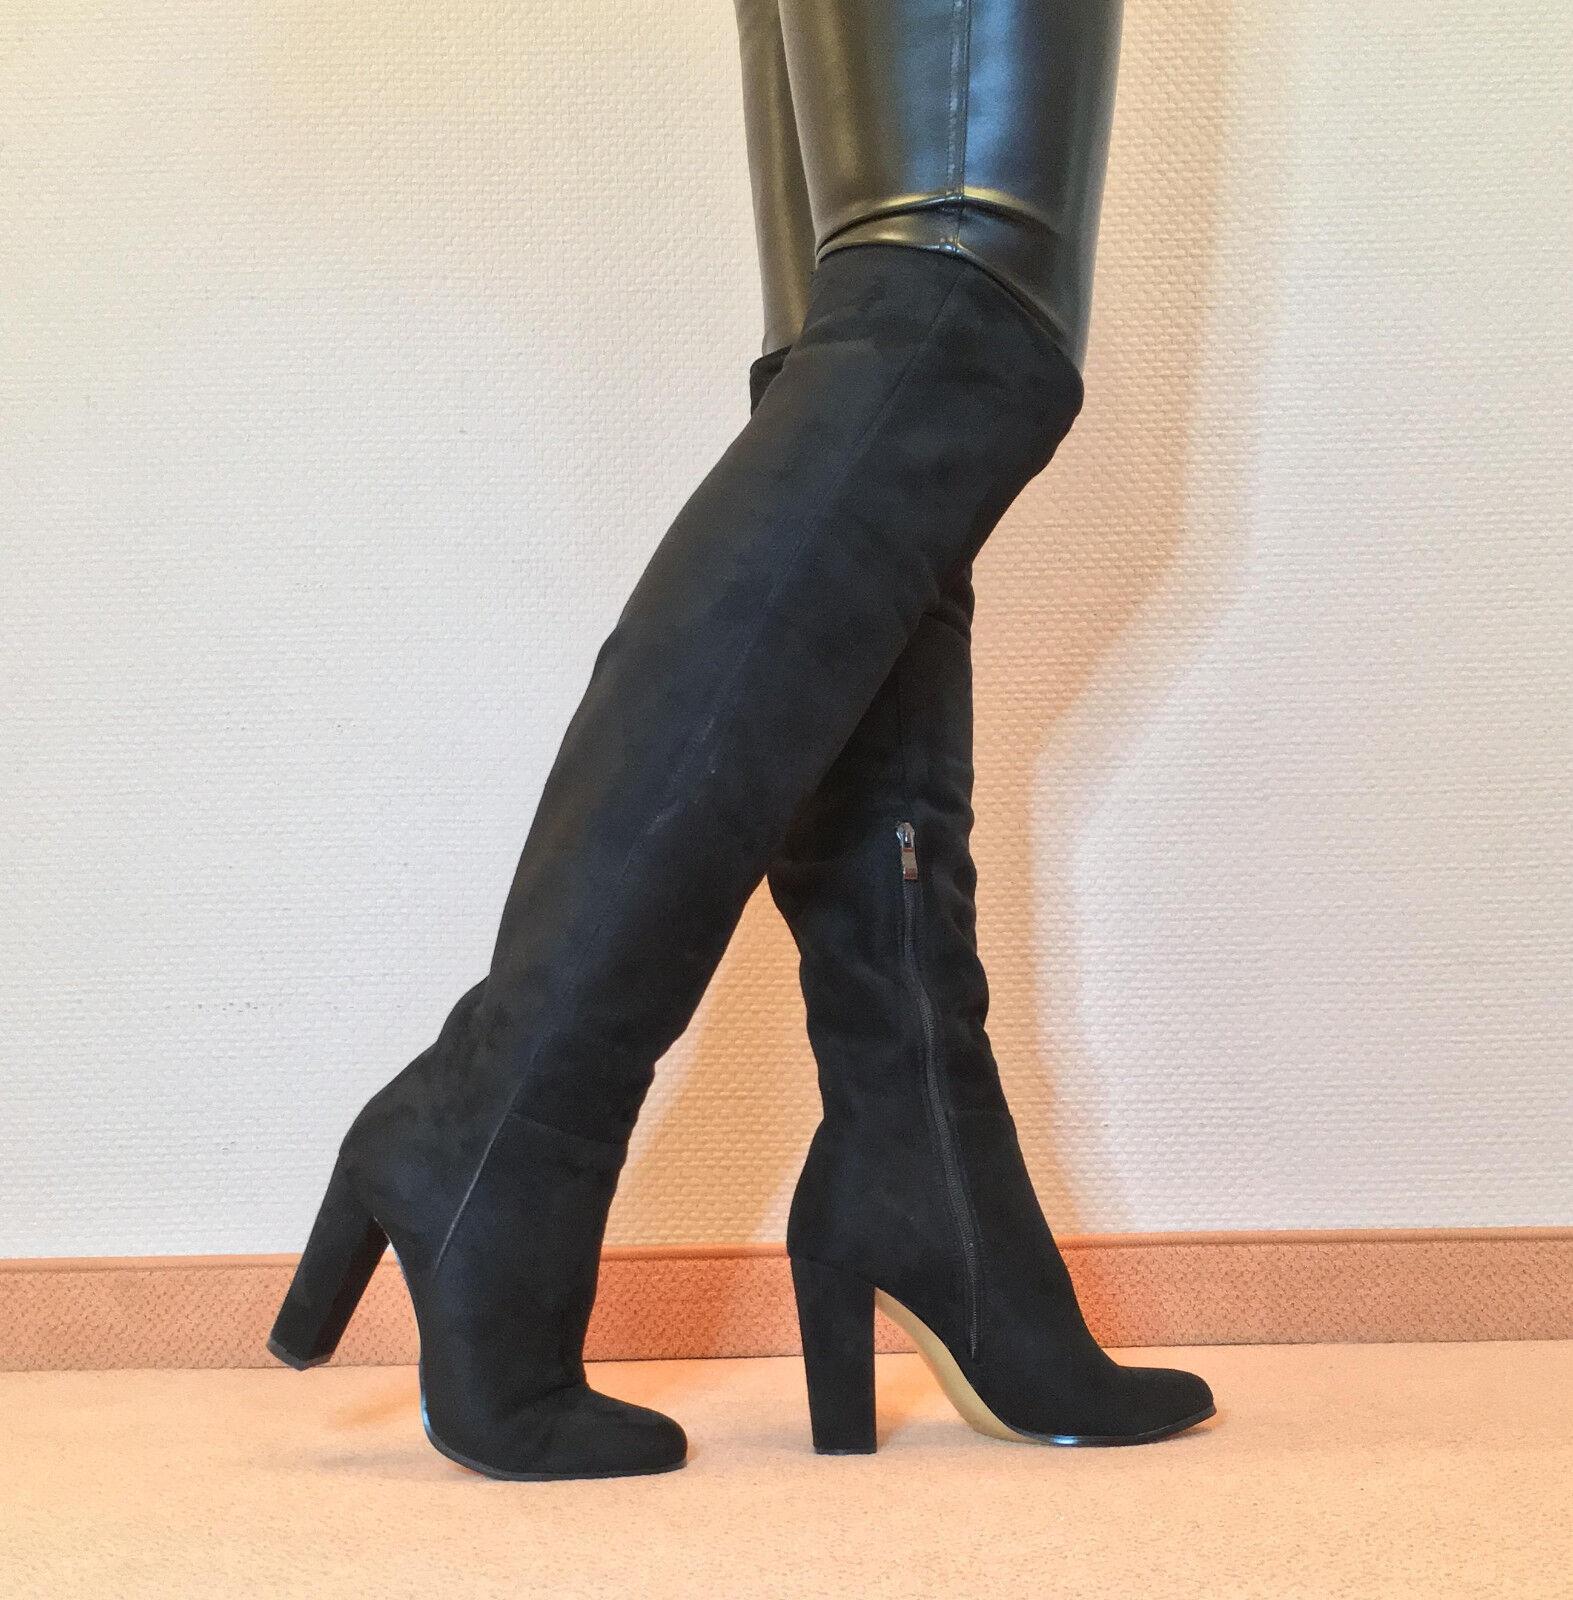 Talla 42 top  en altas exclusiva sexy zapatos señora botas altas en Stiletto botas hombres botas c5 b156bb